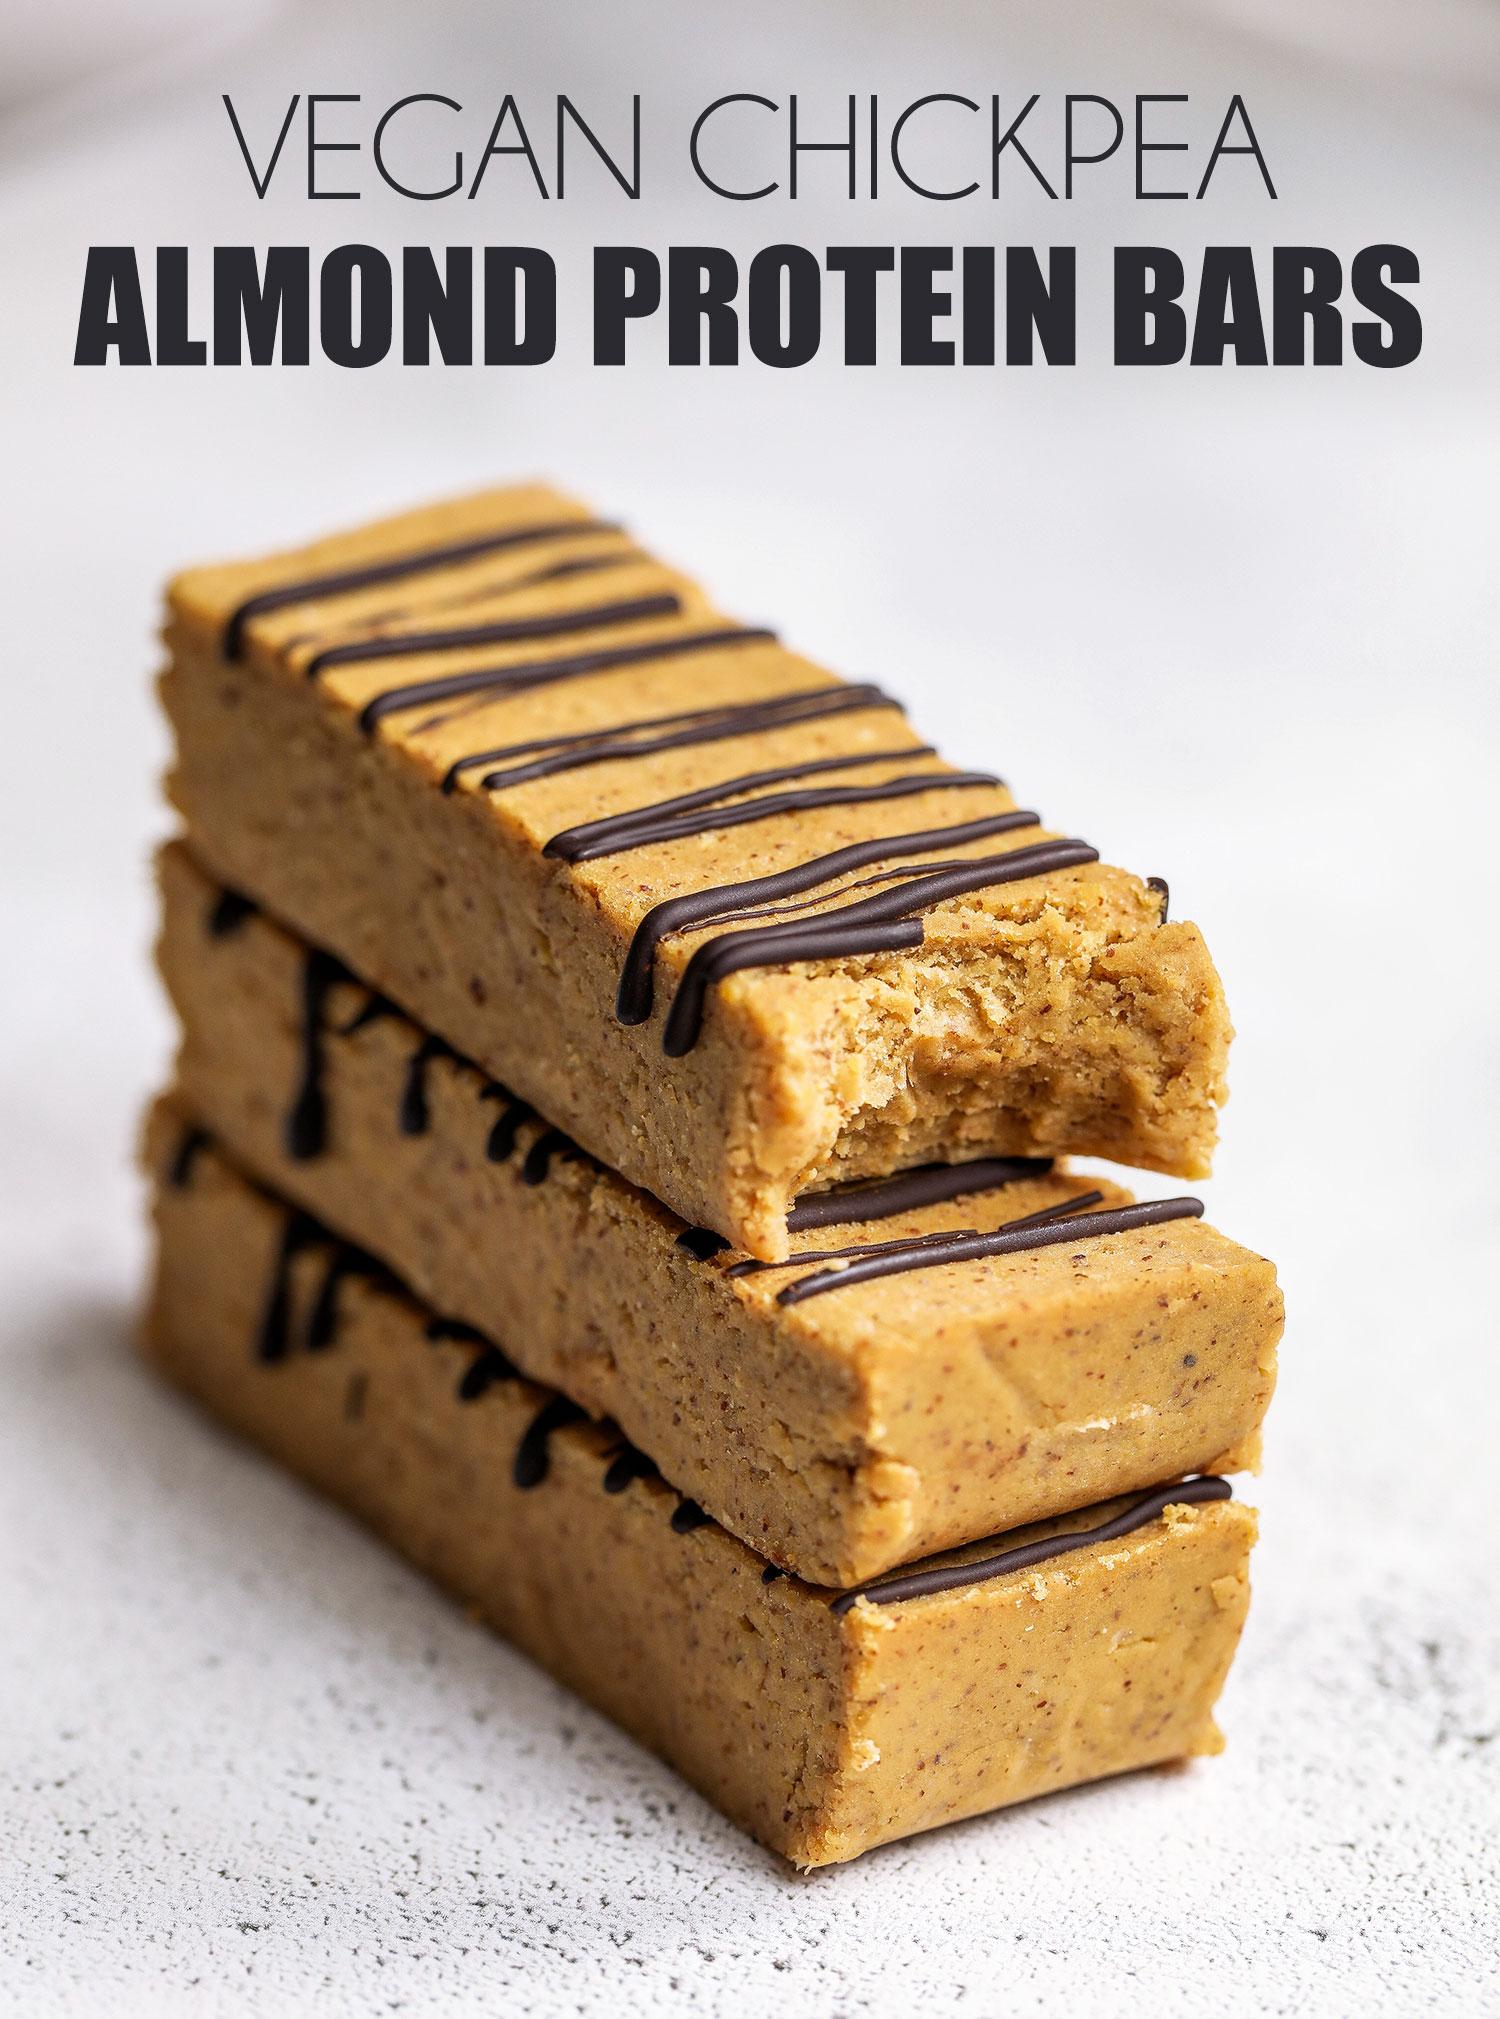 Vegan Chickpea Almond Protein Bars